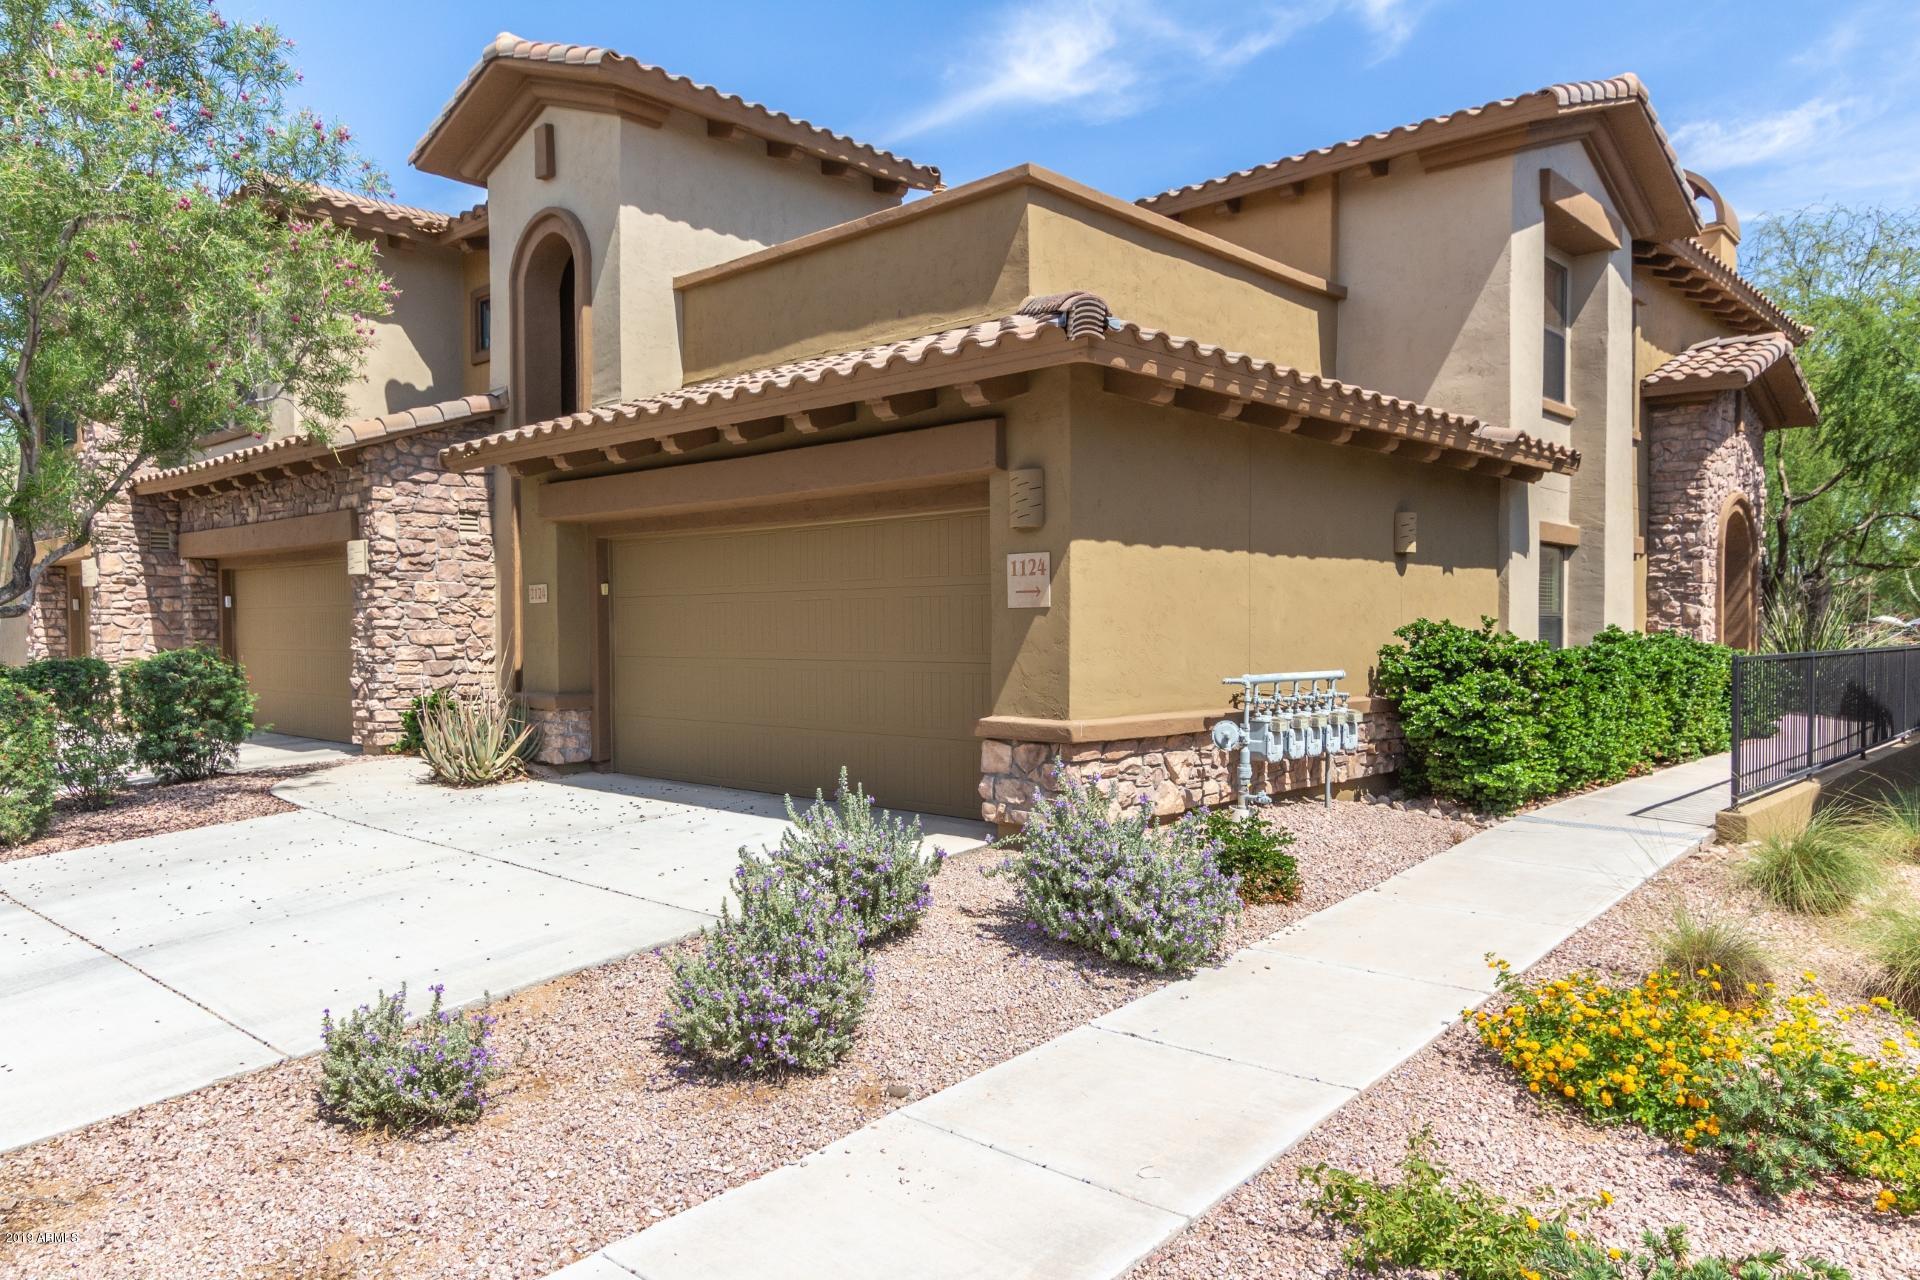 Photo of 21320 N 56TH Street #1124, Phoenix, AZ 85054